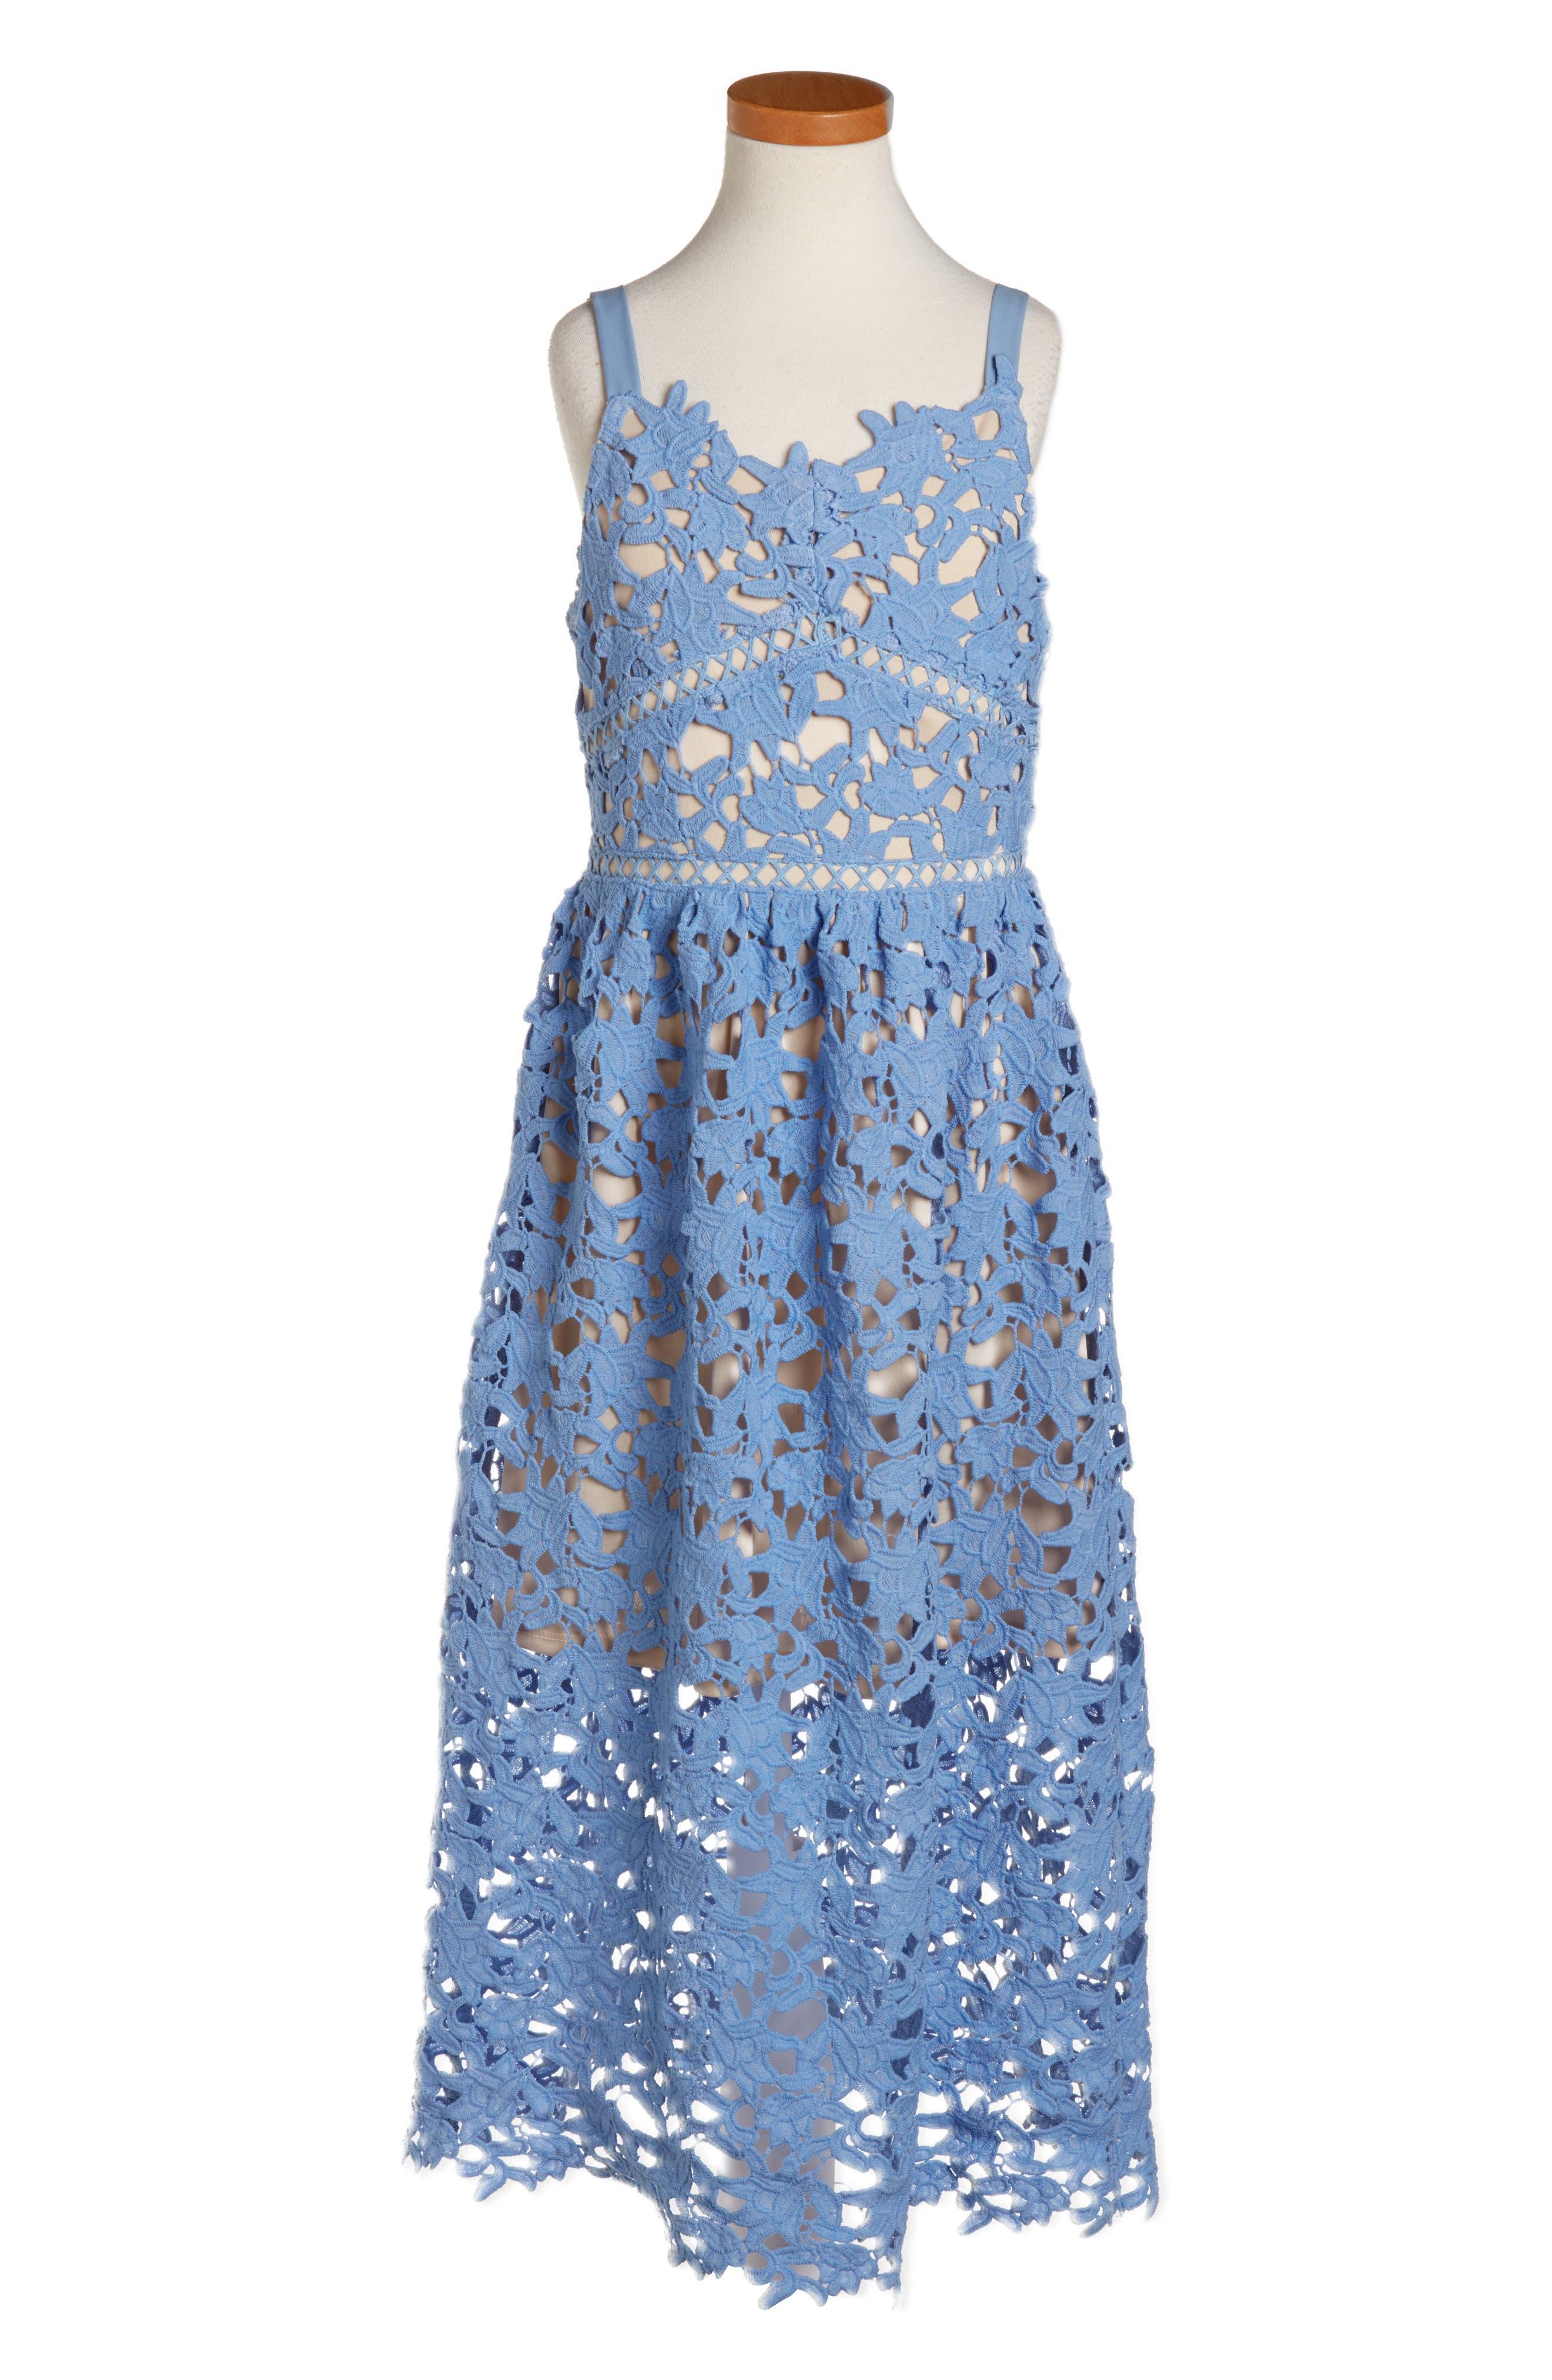 Alternate Image 1 Selected - Trixxi Floral Lace Dress (Big Girls)